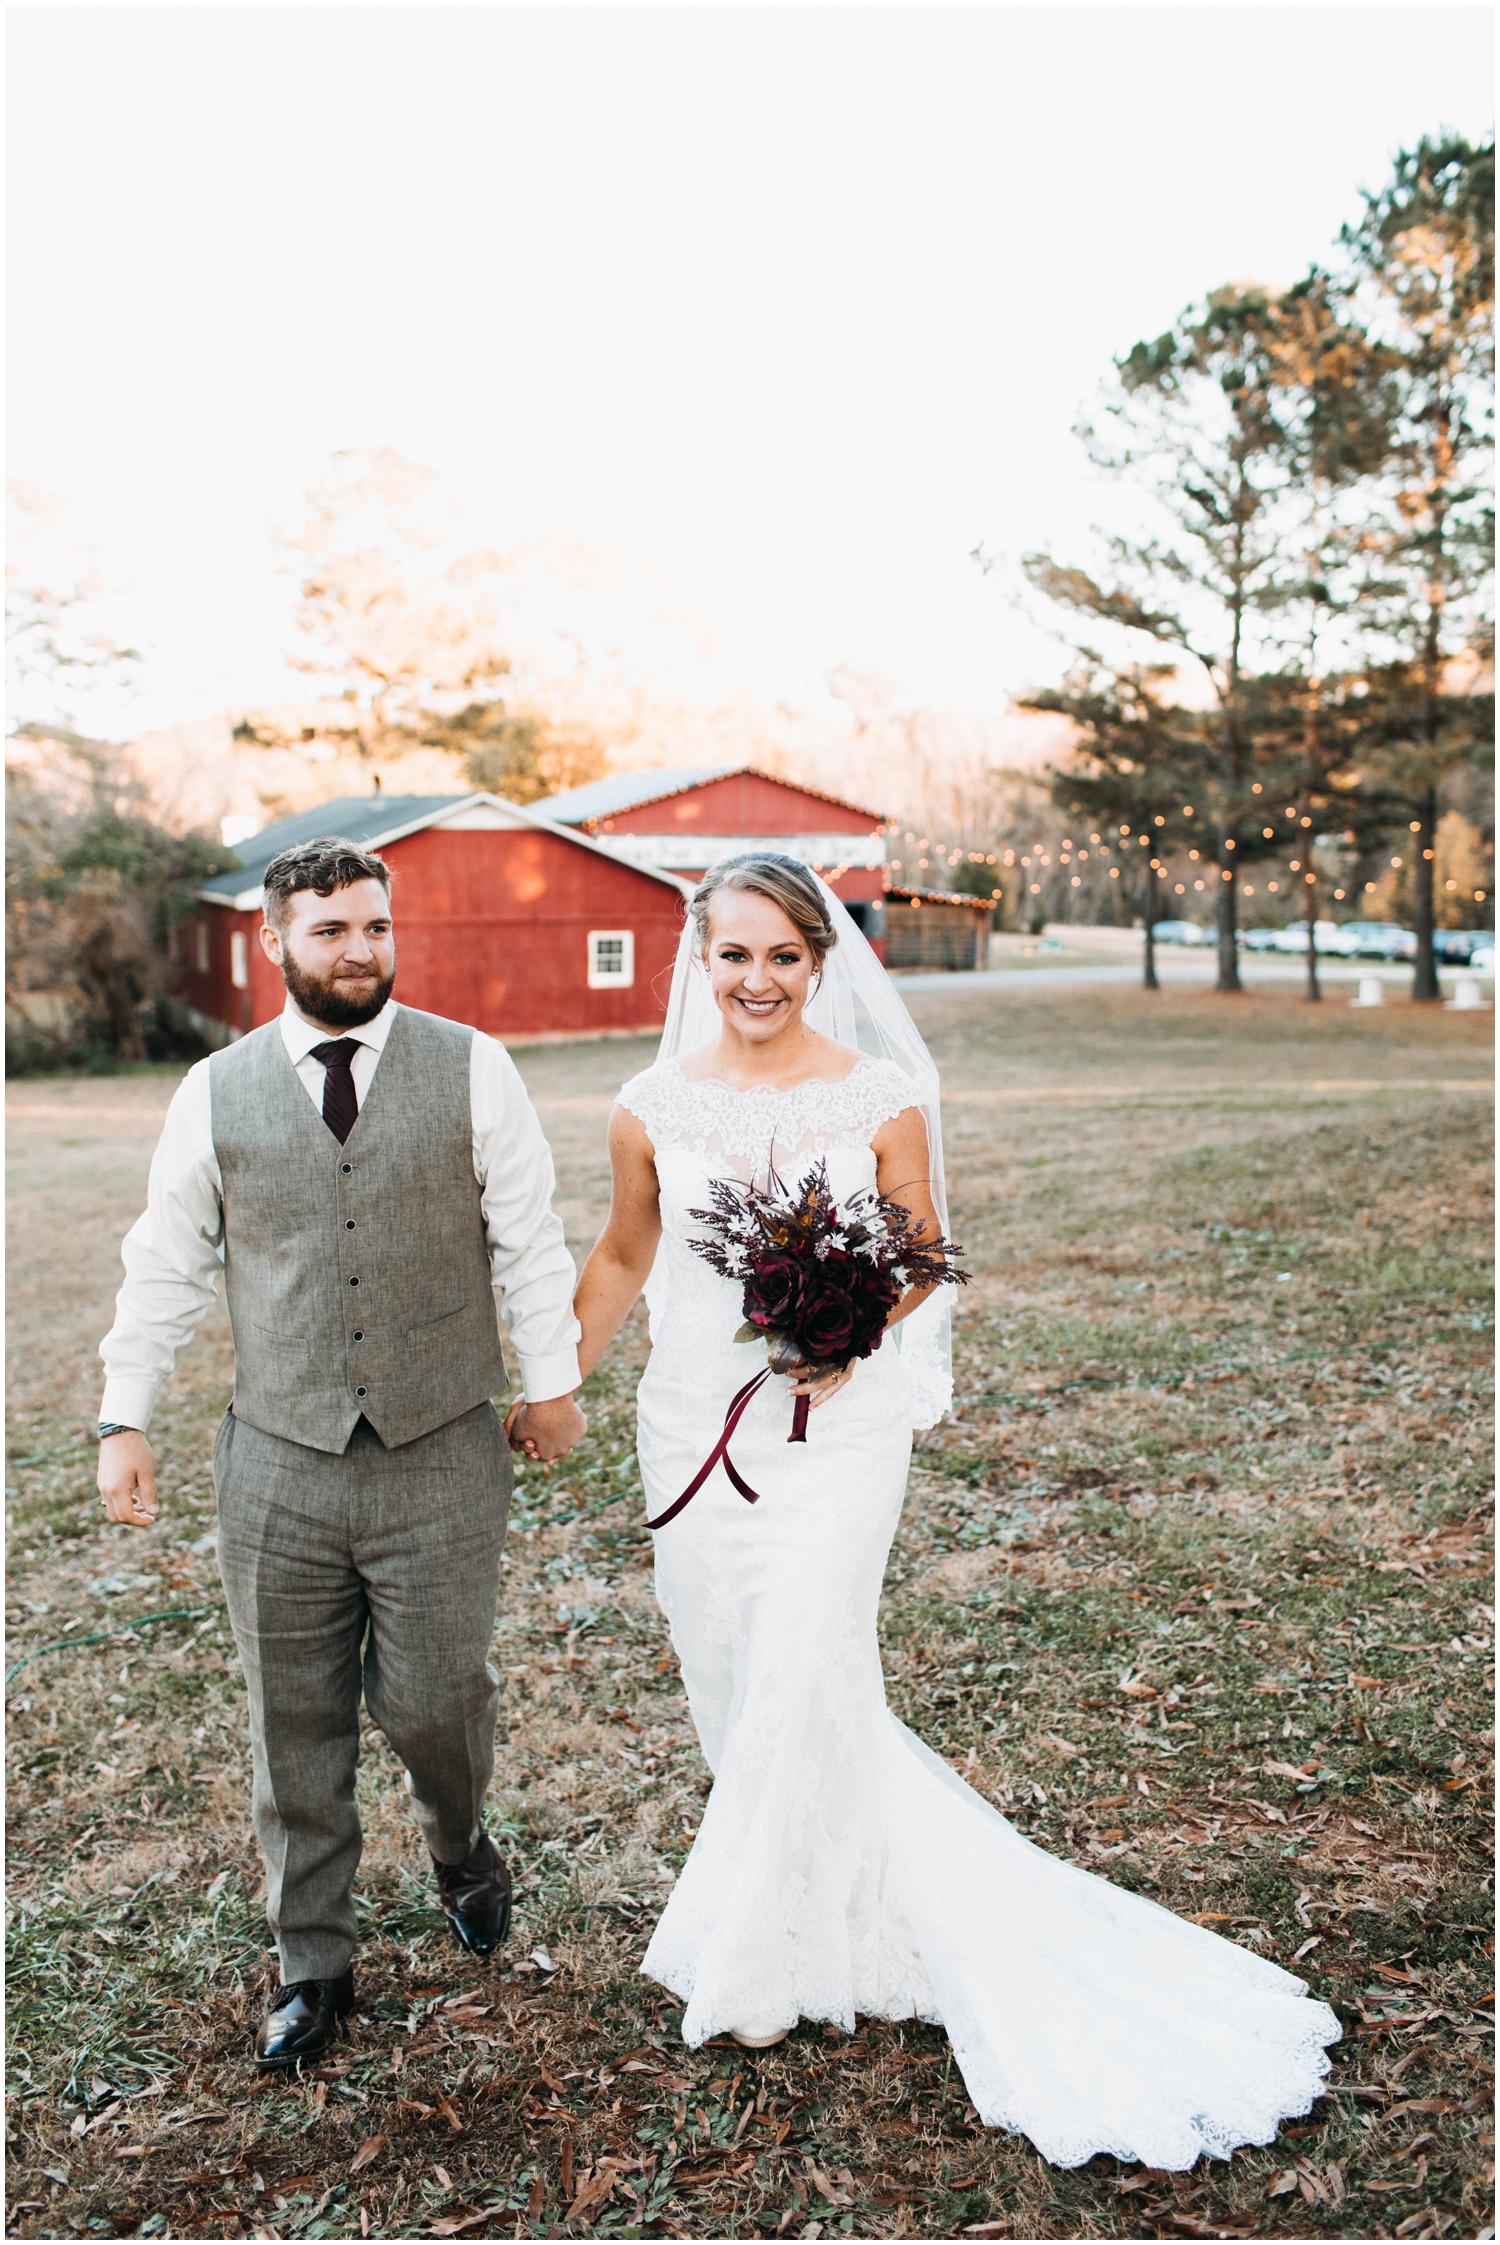 Jess+Dan_rustic_southern_farm_fall_wedding_charlotte_north carolina_taylor powers_0202.jpg